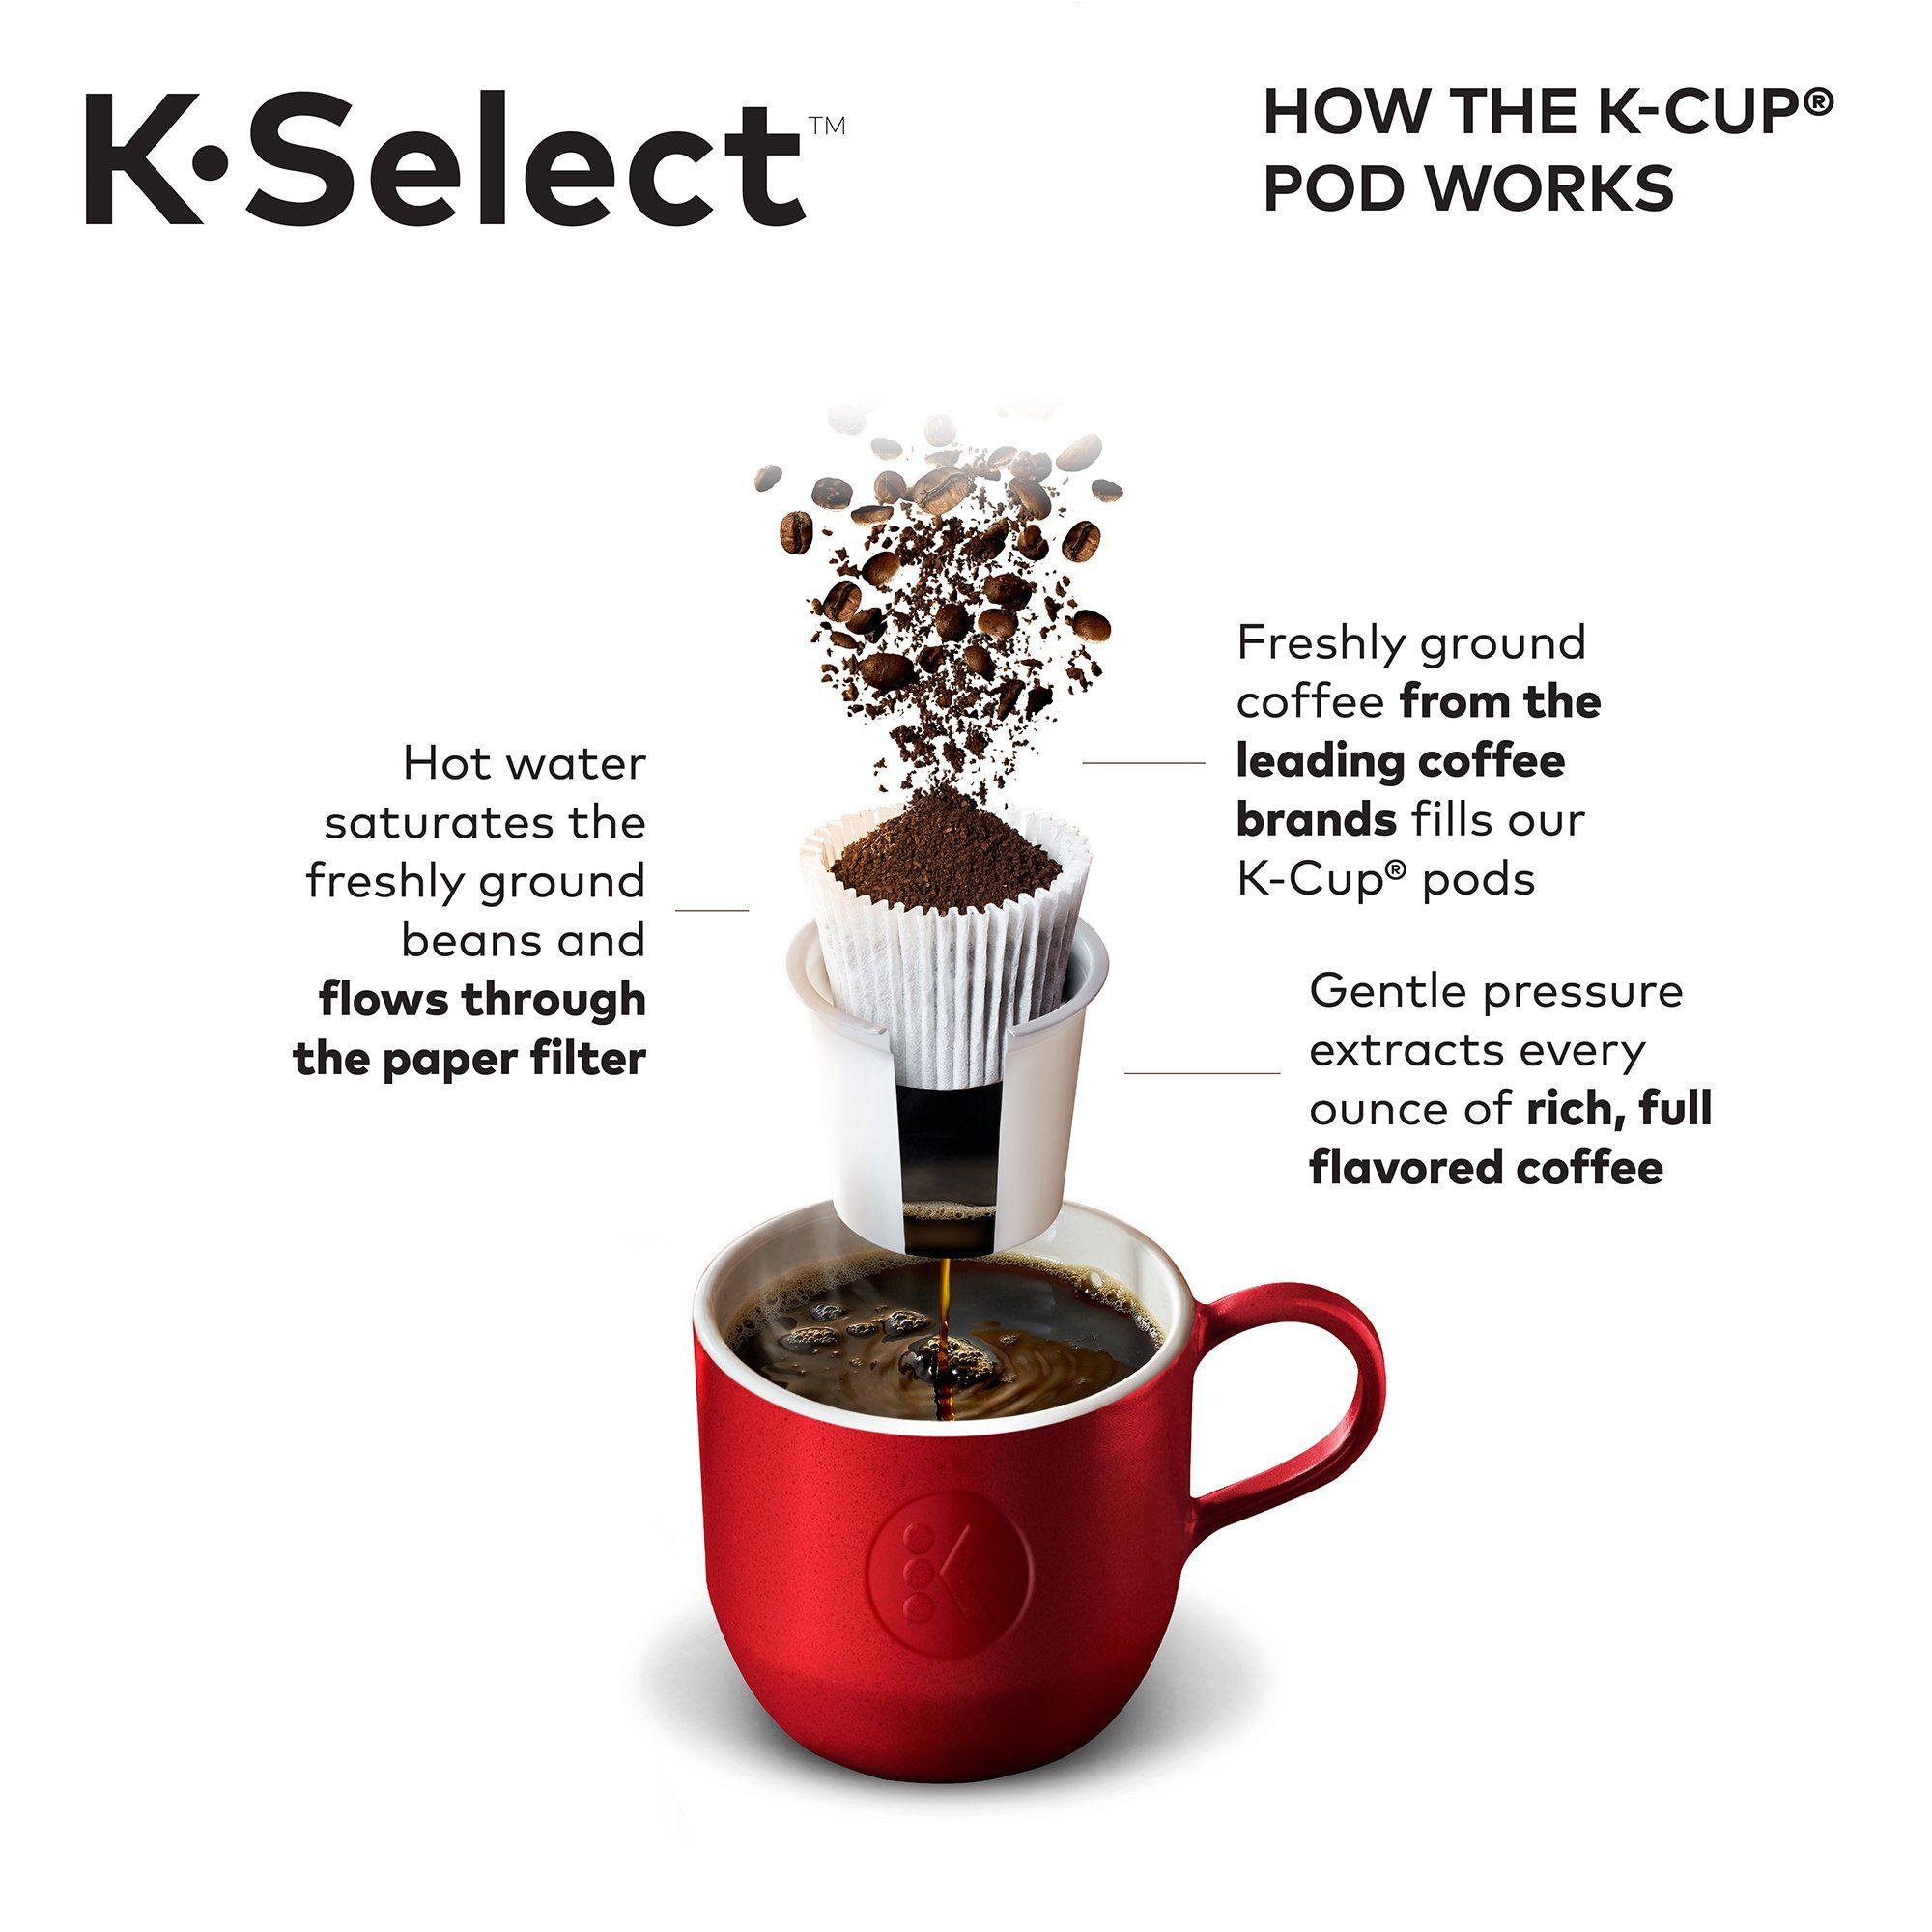 Keurig KSelect SingleServe KCup Pod Coffee Maker with 12oz